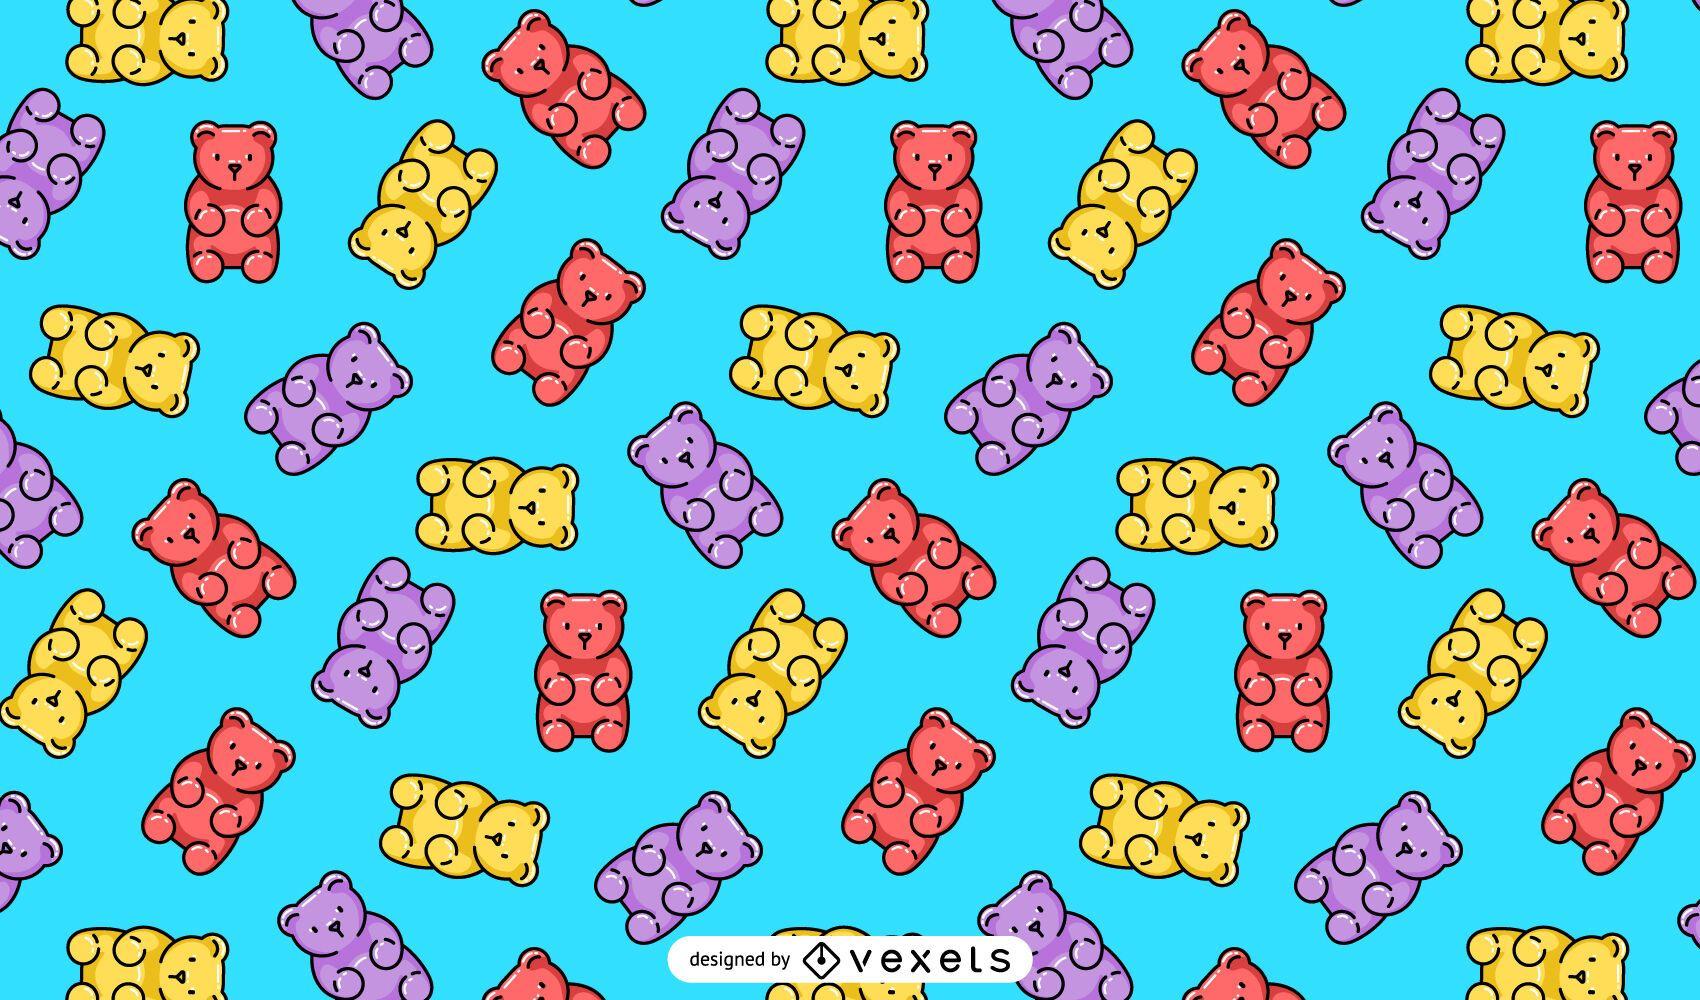 Gummibärchen Musterdesign